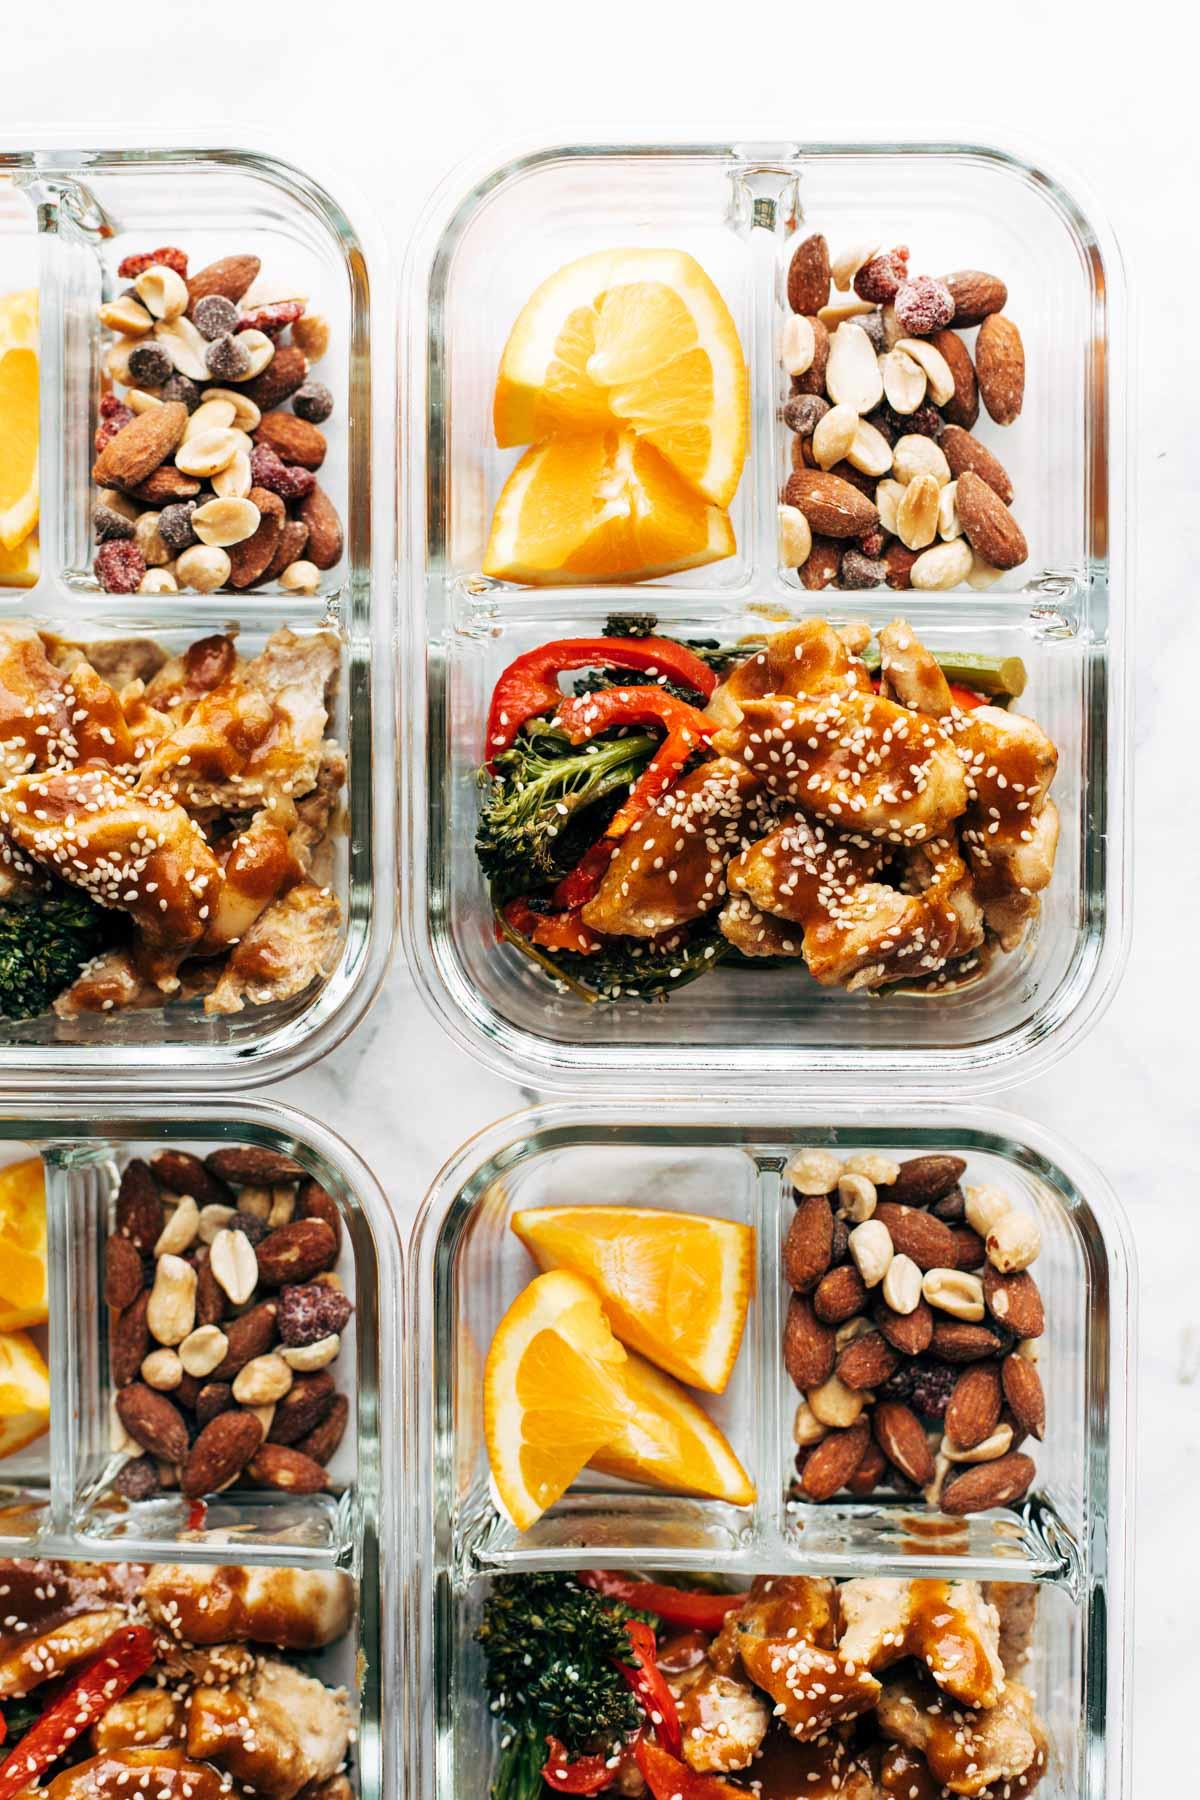 Sheet Pan Garlic Ginger Chicken & Broccoli from pinchofyum.com on foodiecrush.com